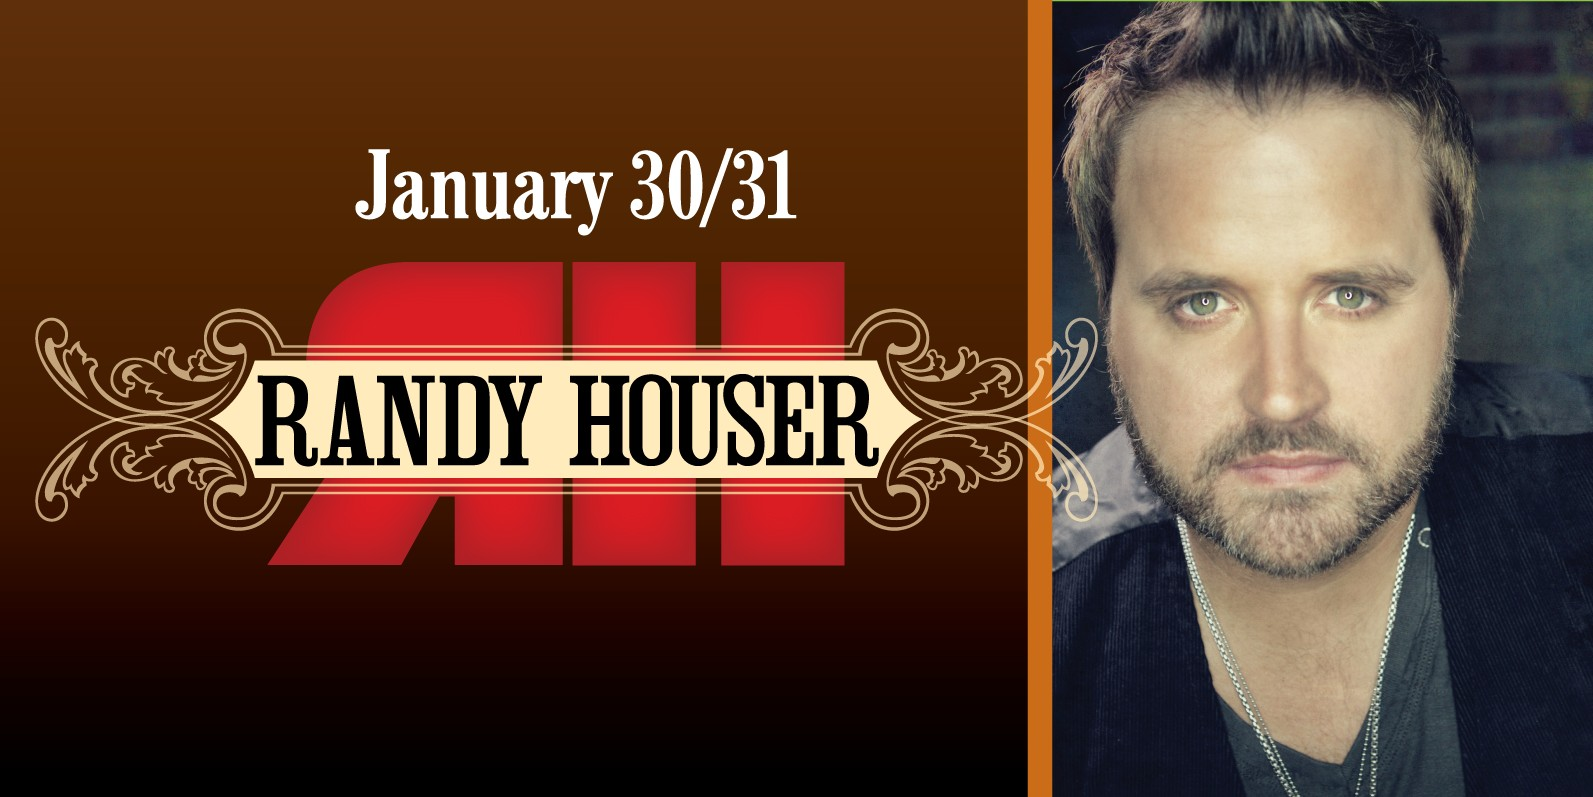 Randy Houser Web Image